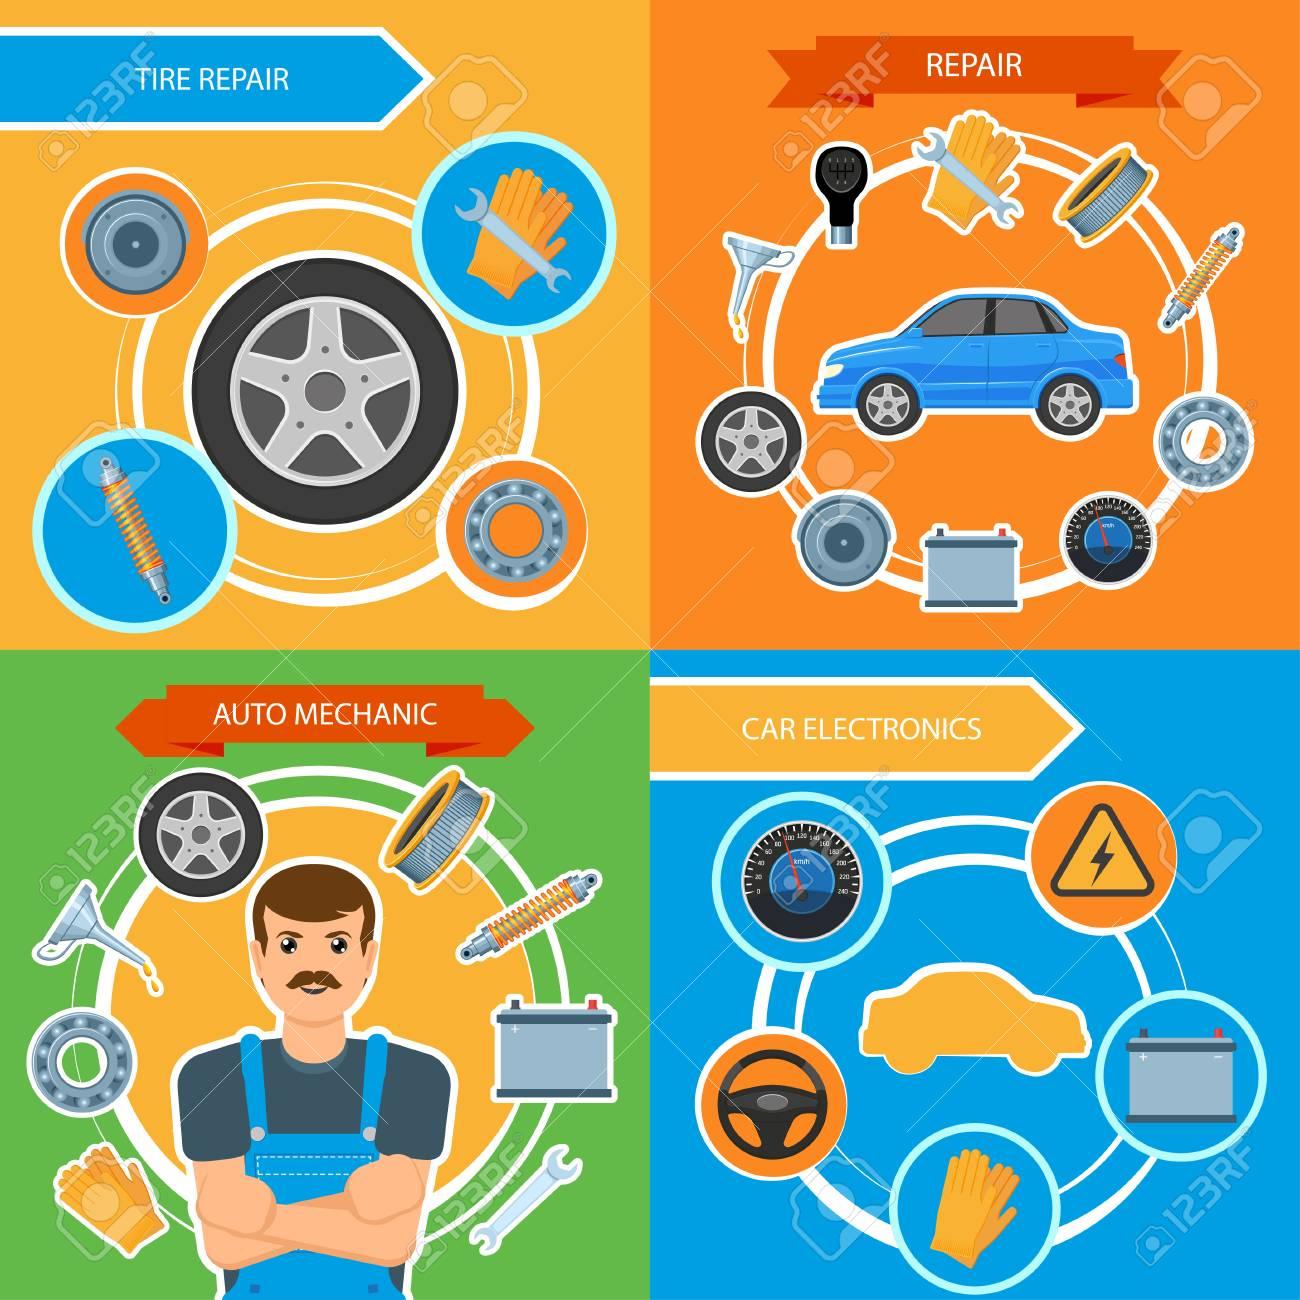 Car Repair And Maintenance >> Vector Flat Car Repair Maintenance Mechanics Services Infographic